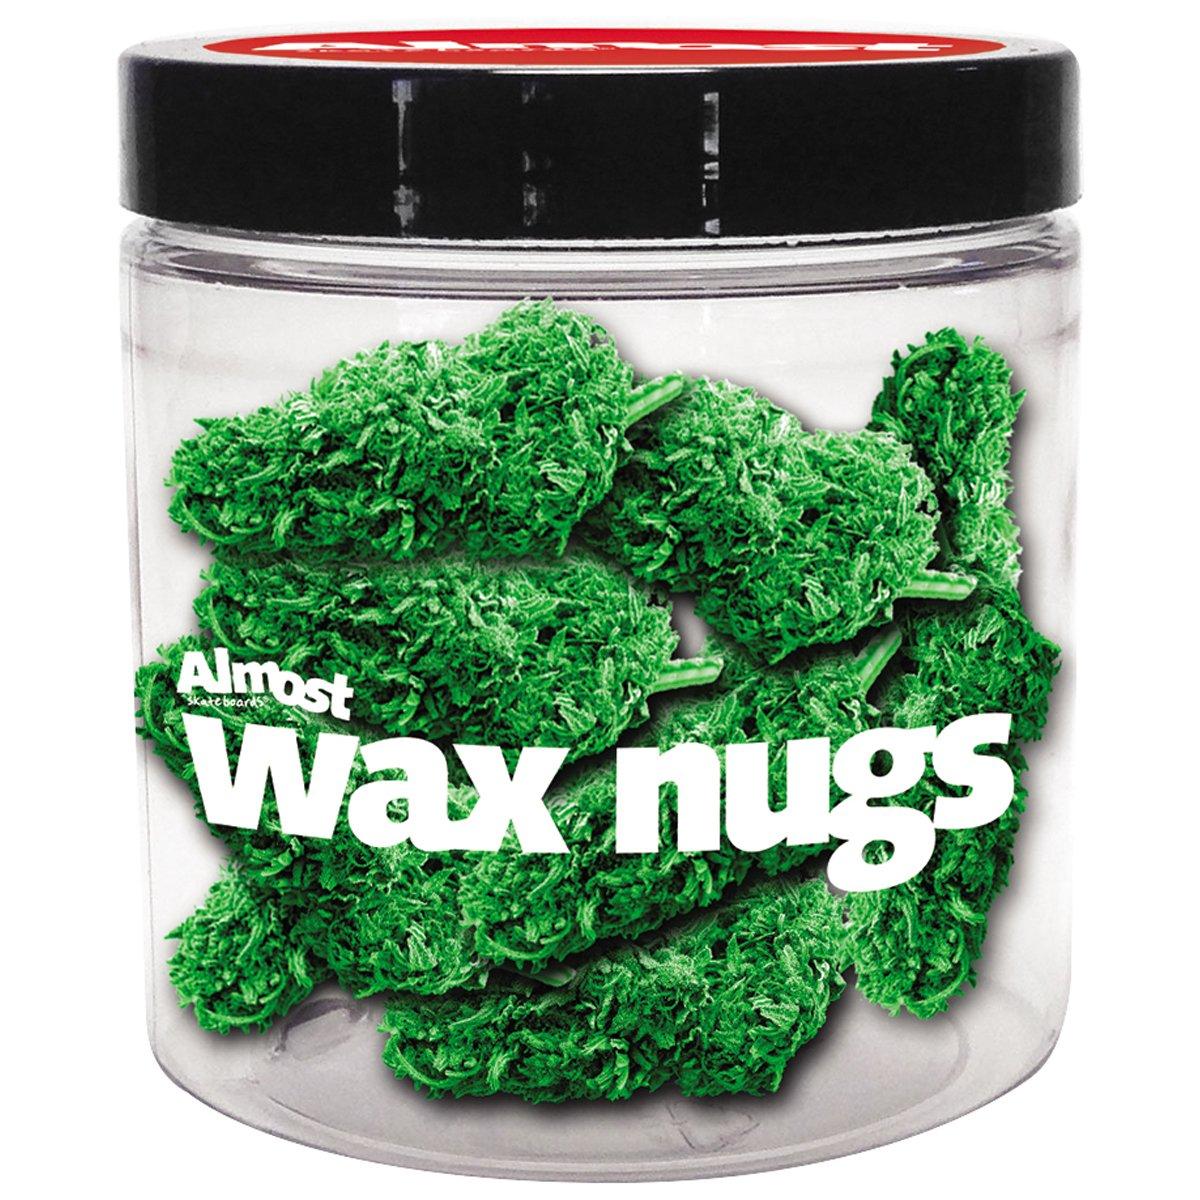 Almost Wax Nugs Skateboard Wax - Green, 18 pk by Almost